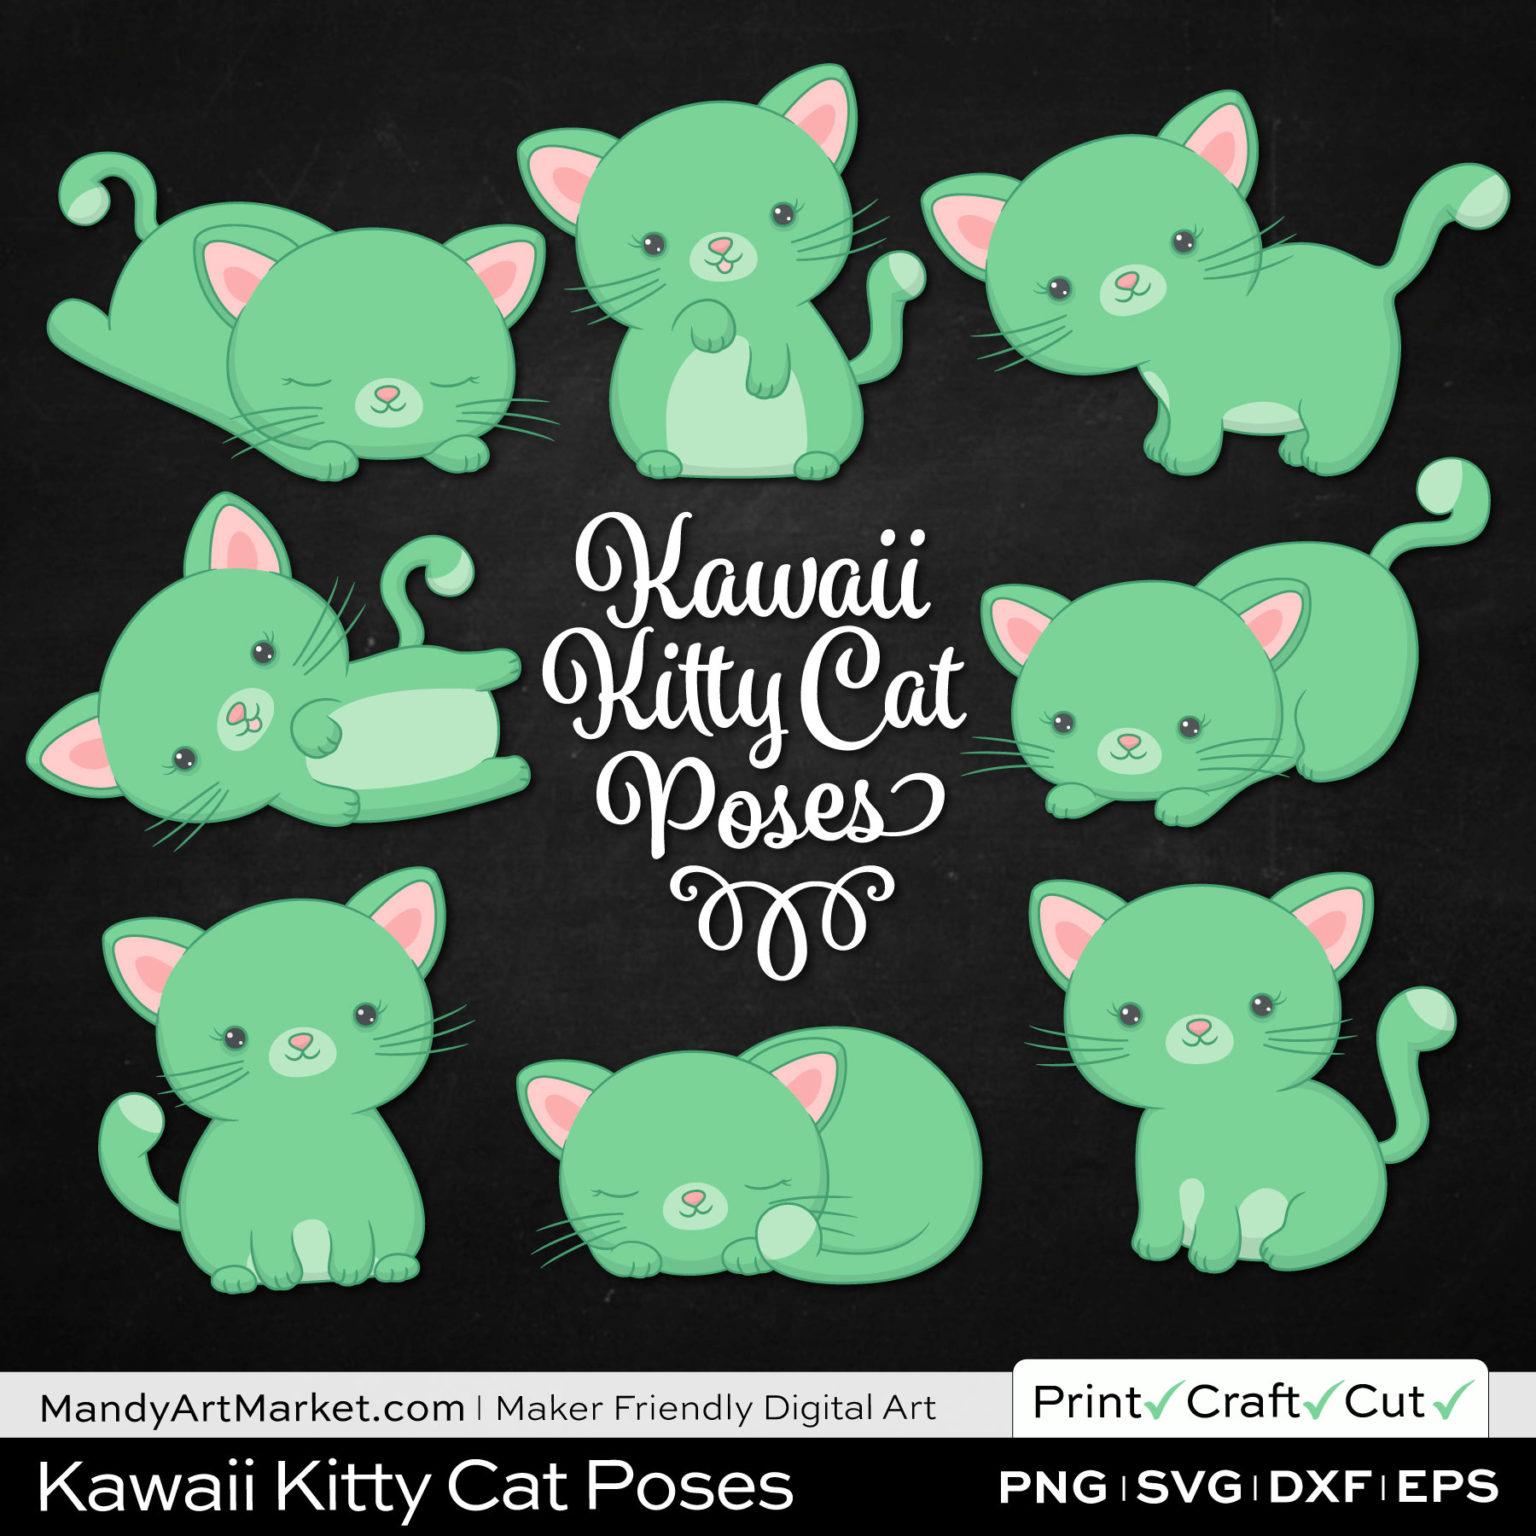 Light Fern Green Kawaii Kitty Cat Poses Clipart on Black Background